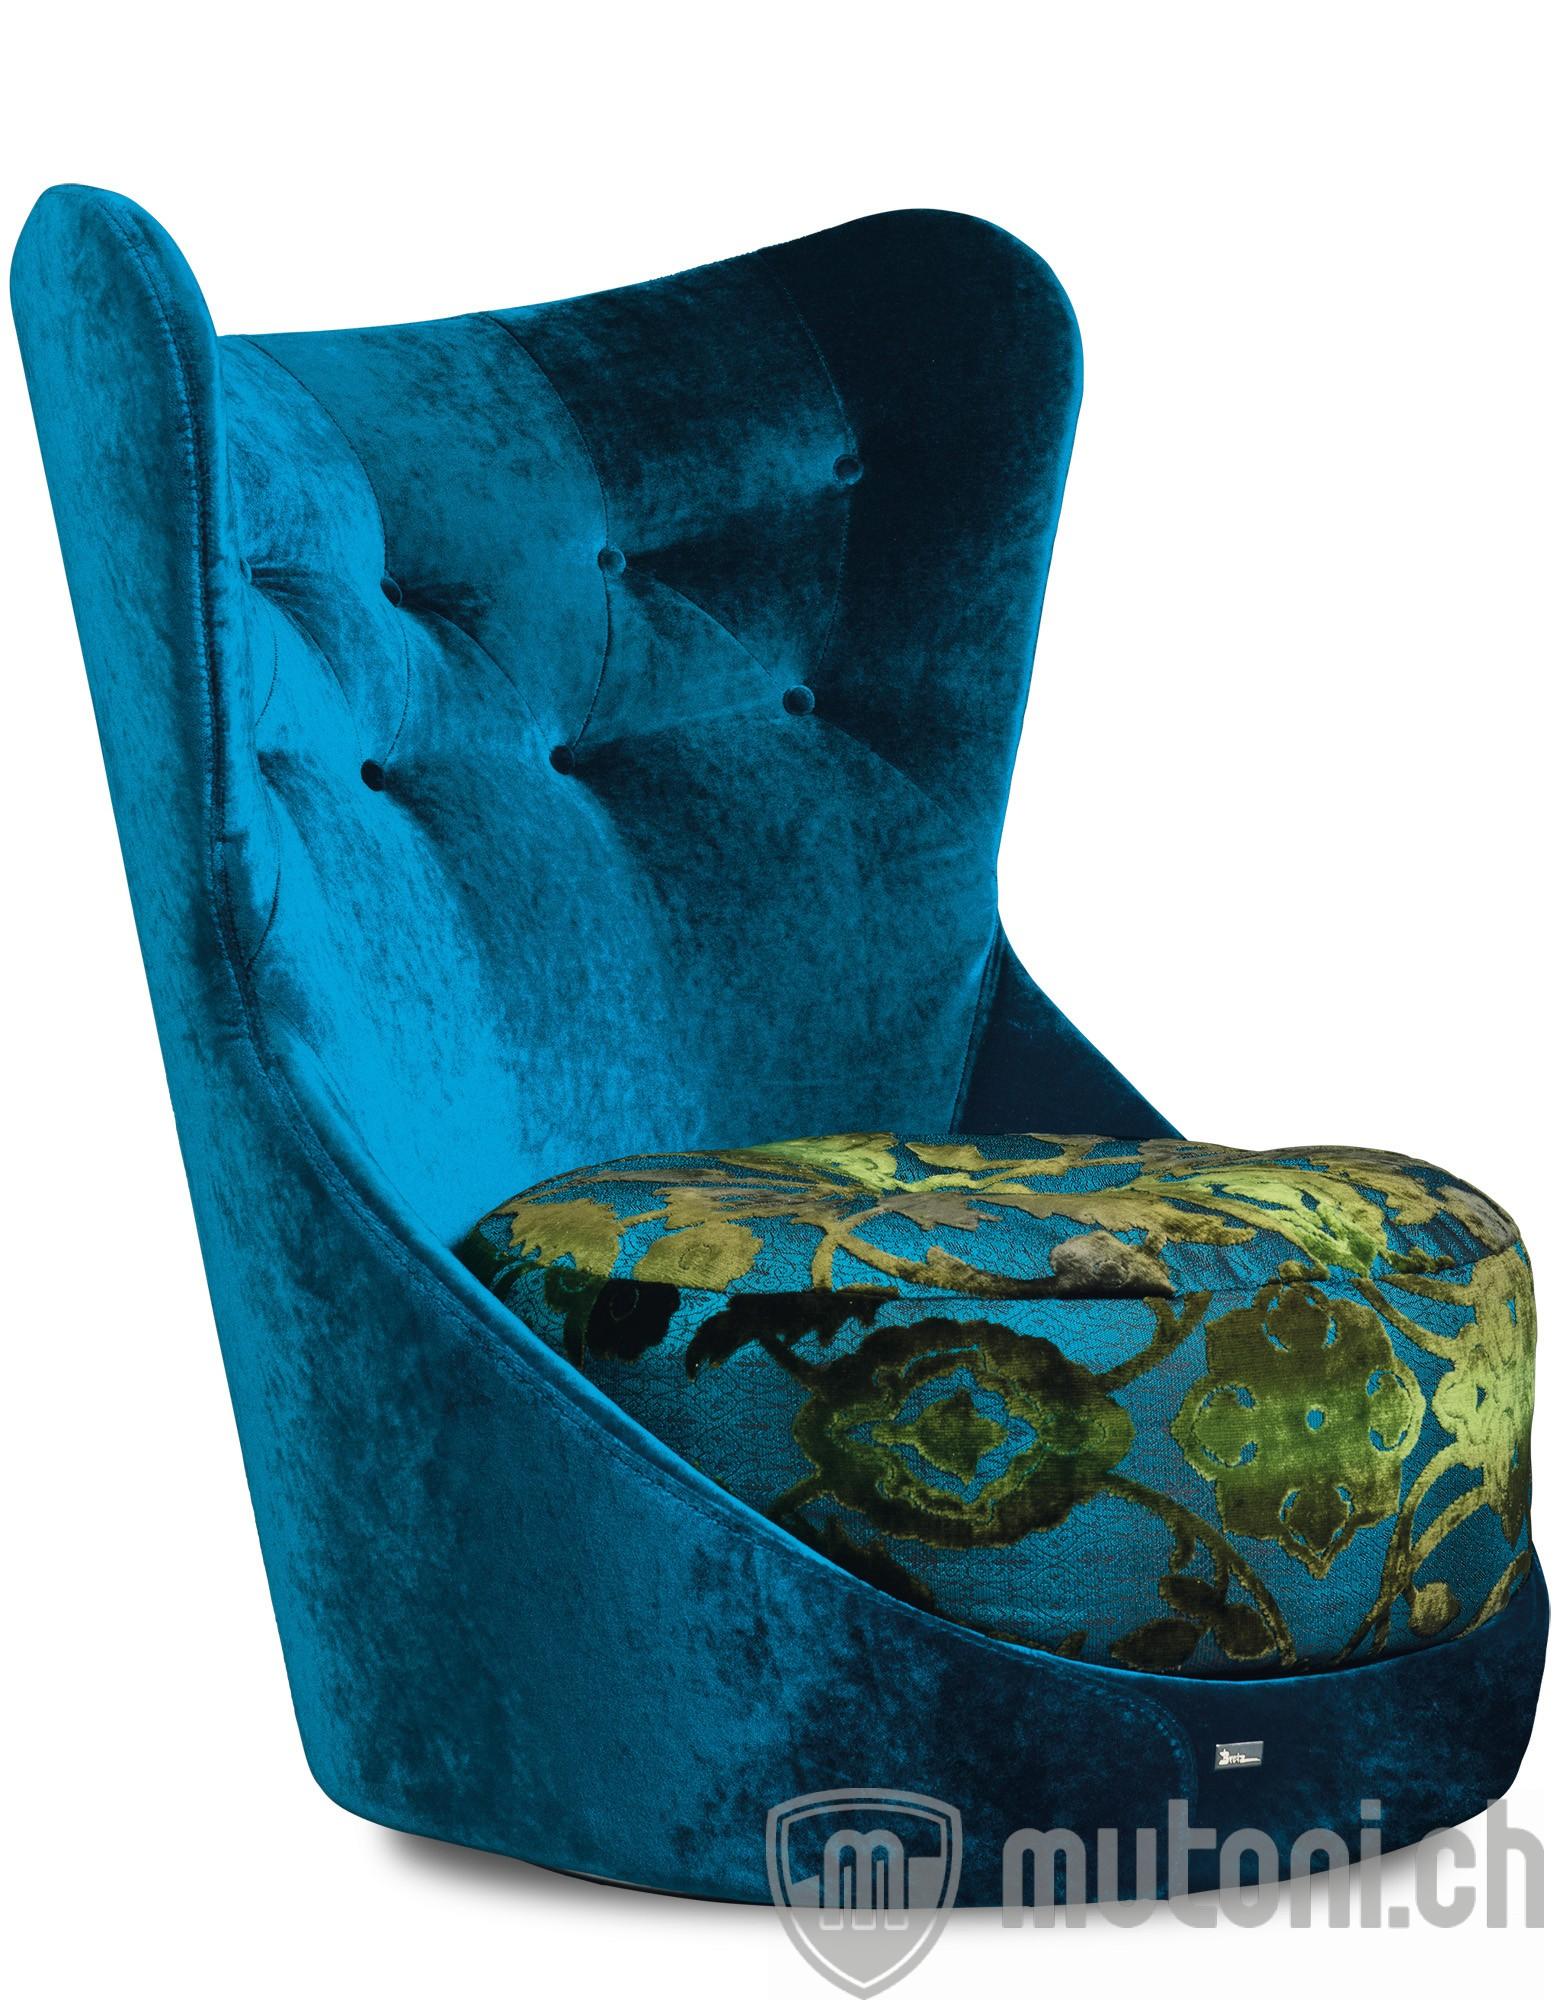 drehsessel cocoa island enzianblau bretz mutoni m bel. Black Bedroom Furniture Sets. Home Design Ideas